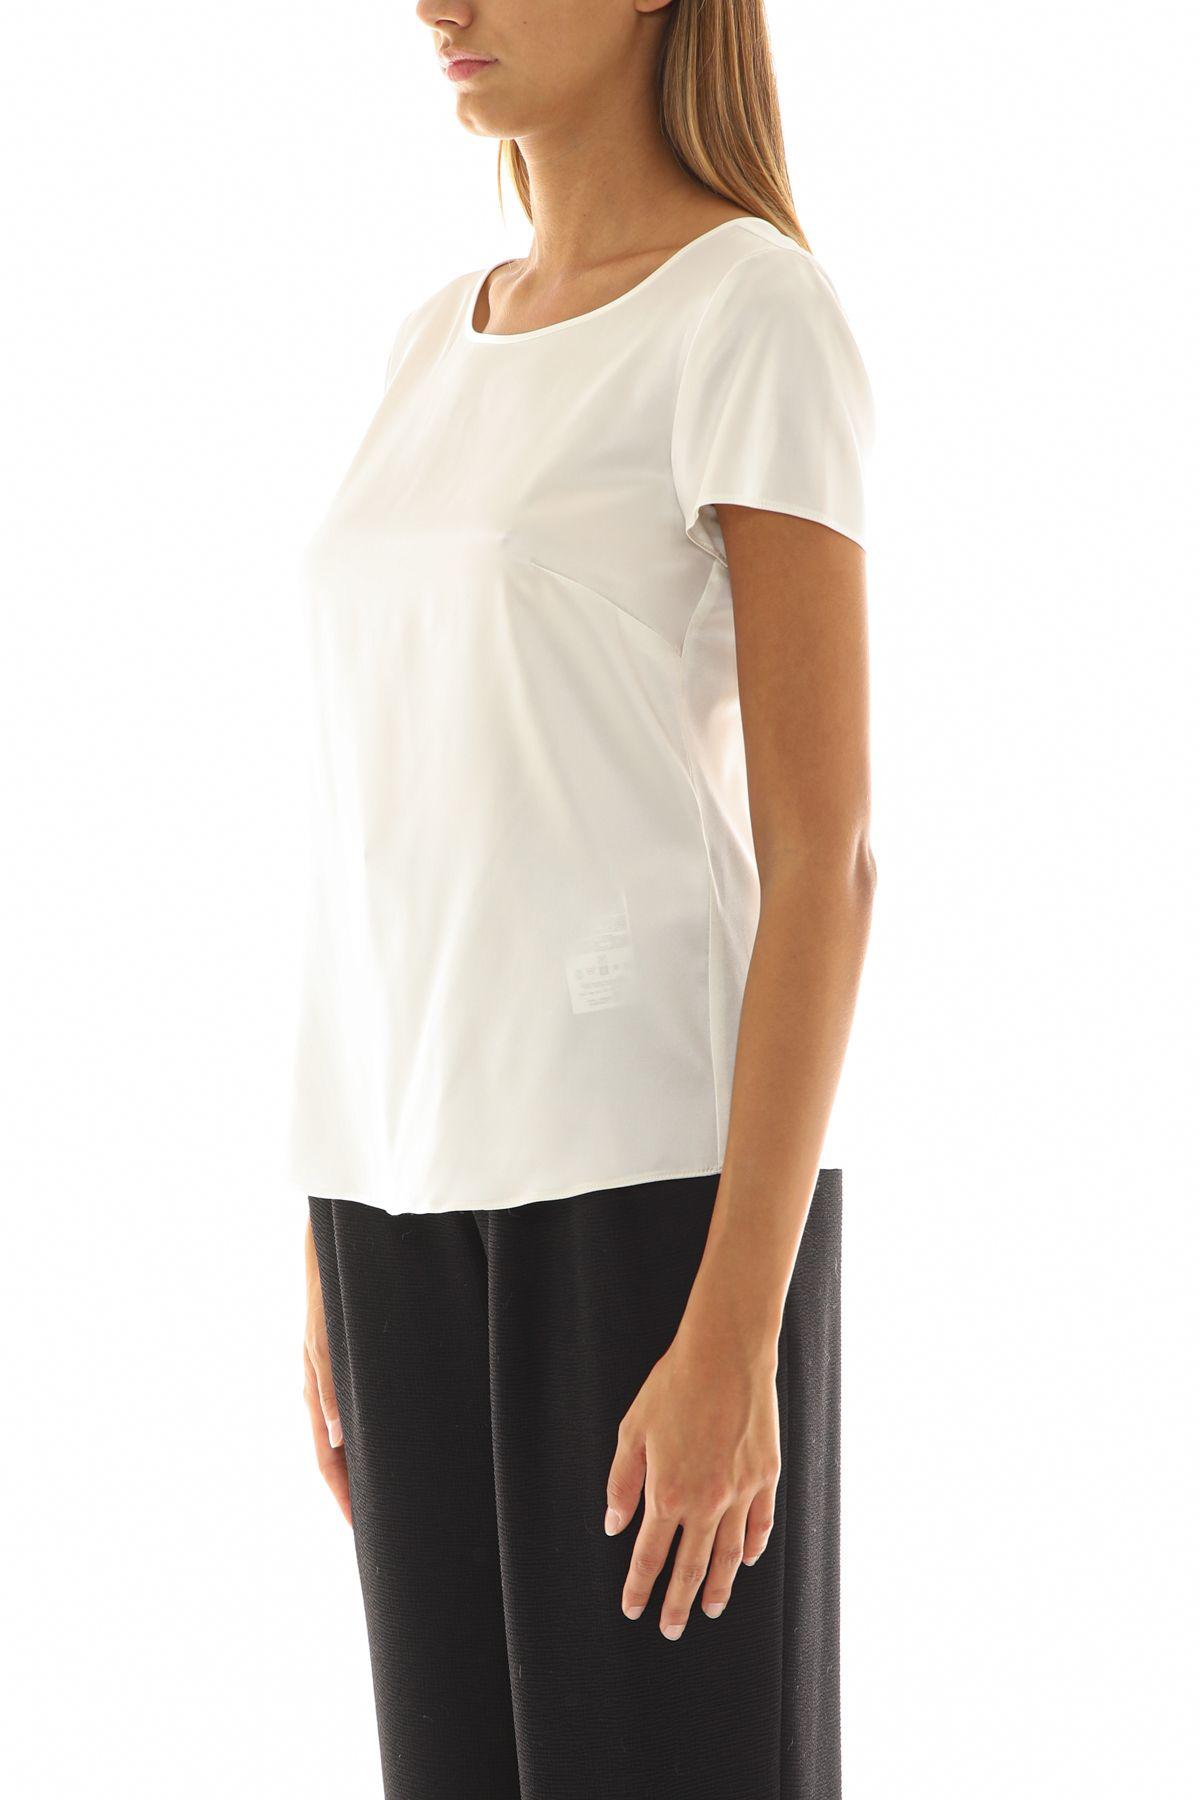 EMPORIO ARMANI Cottons EMPORIO ARMANI WOMEN'S WHITE COTTON T-SHIRT